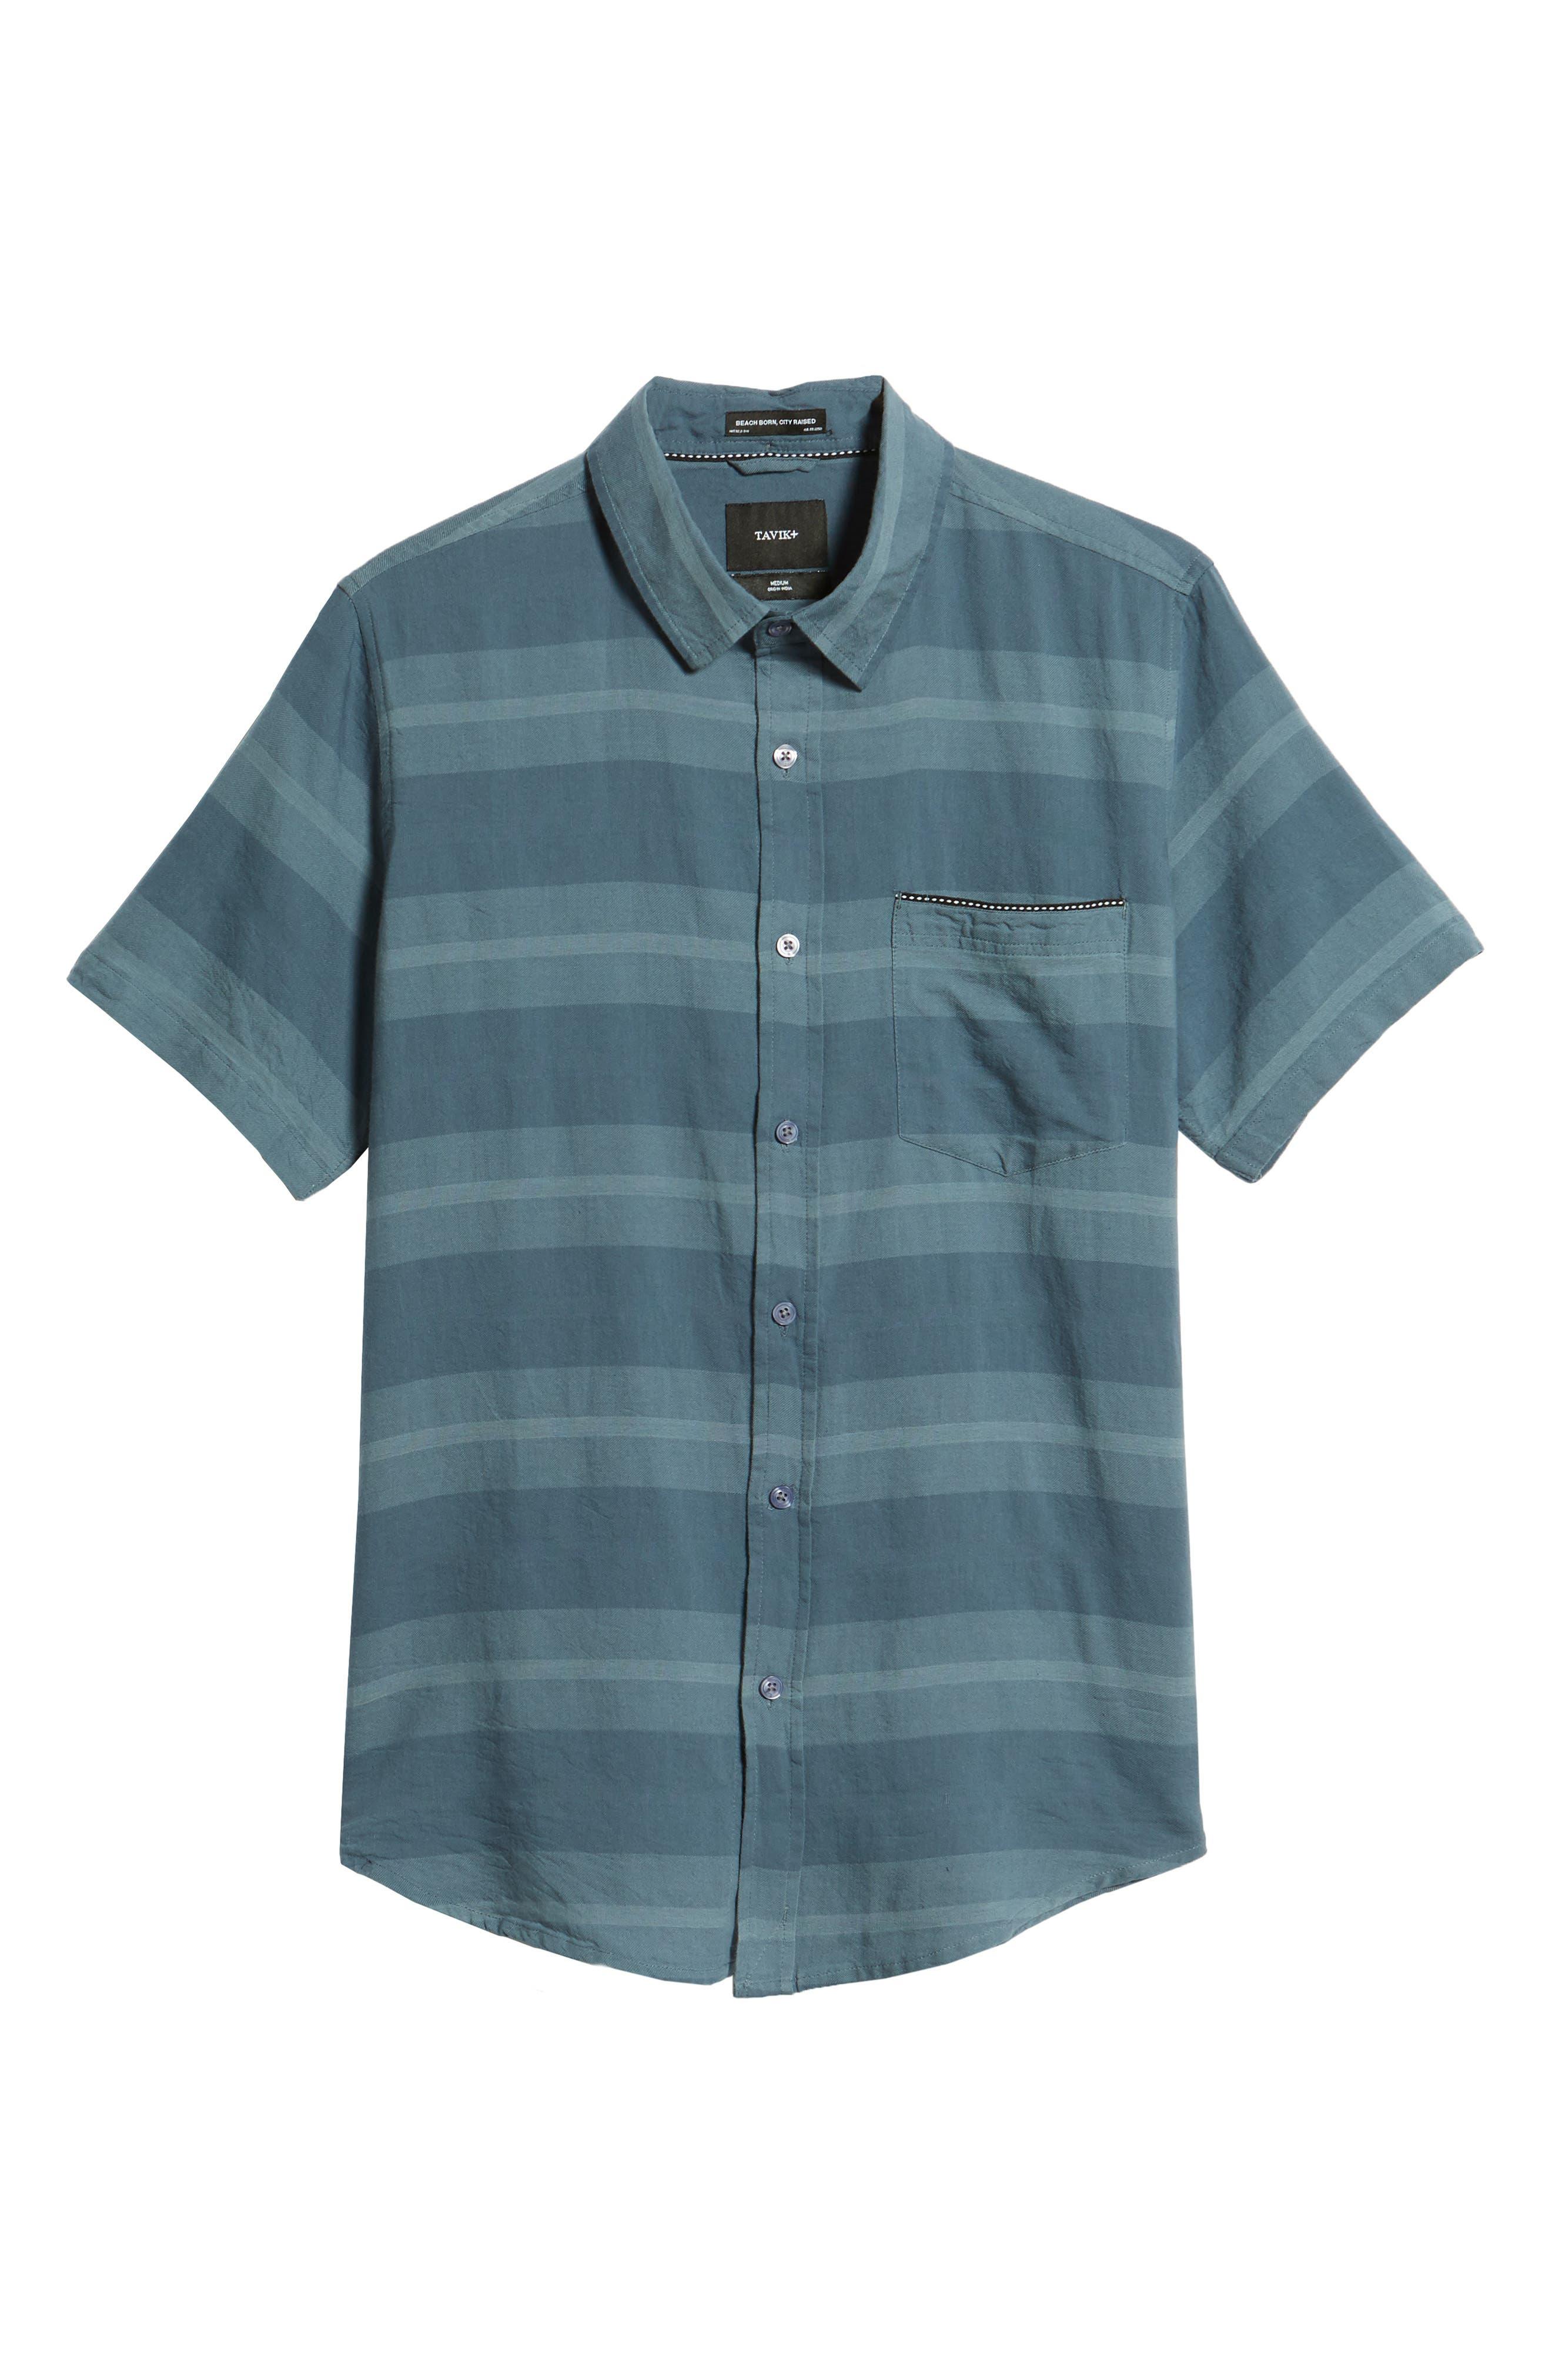 Dobson Woven Shirt,                             Alternate thumbnail 6, color,                             Storm Blue/Prison Blue Stripe